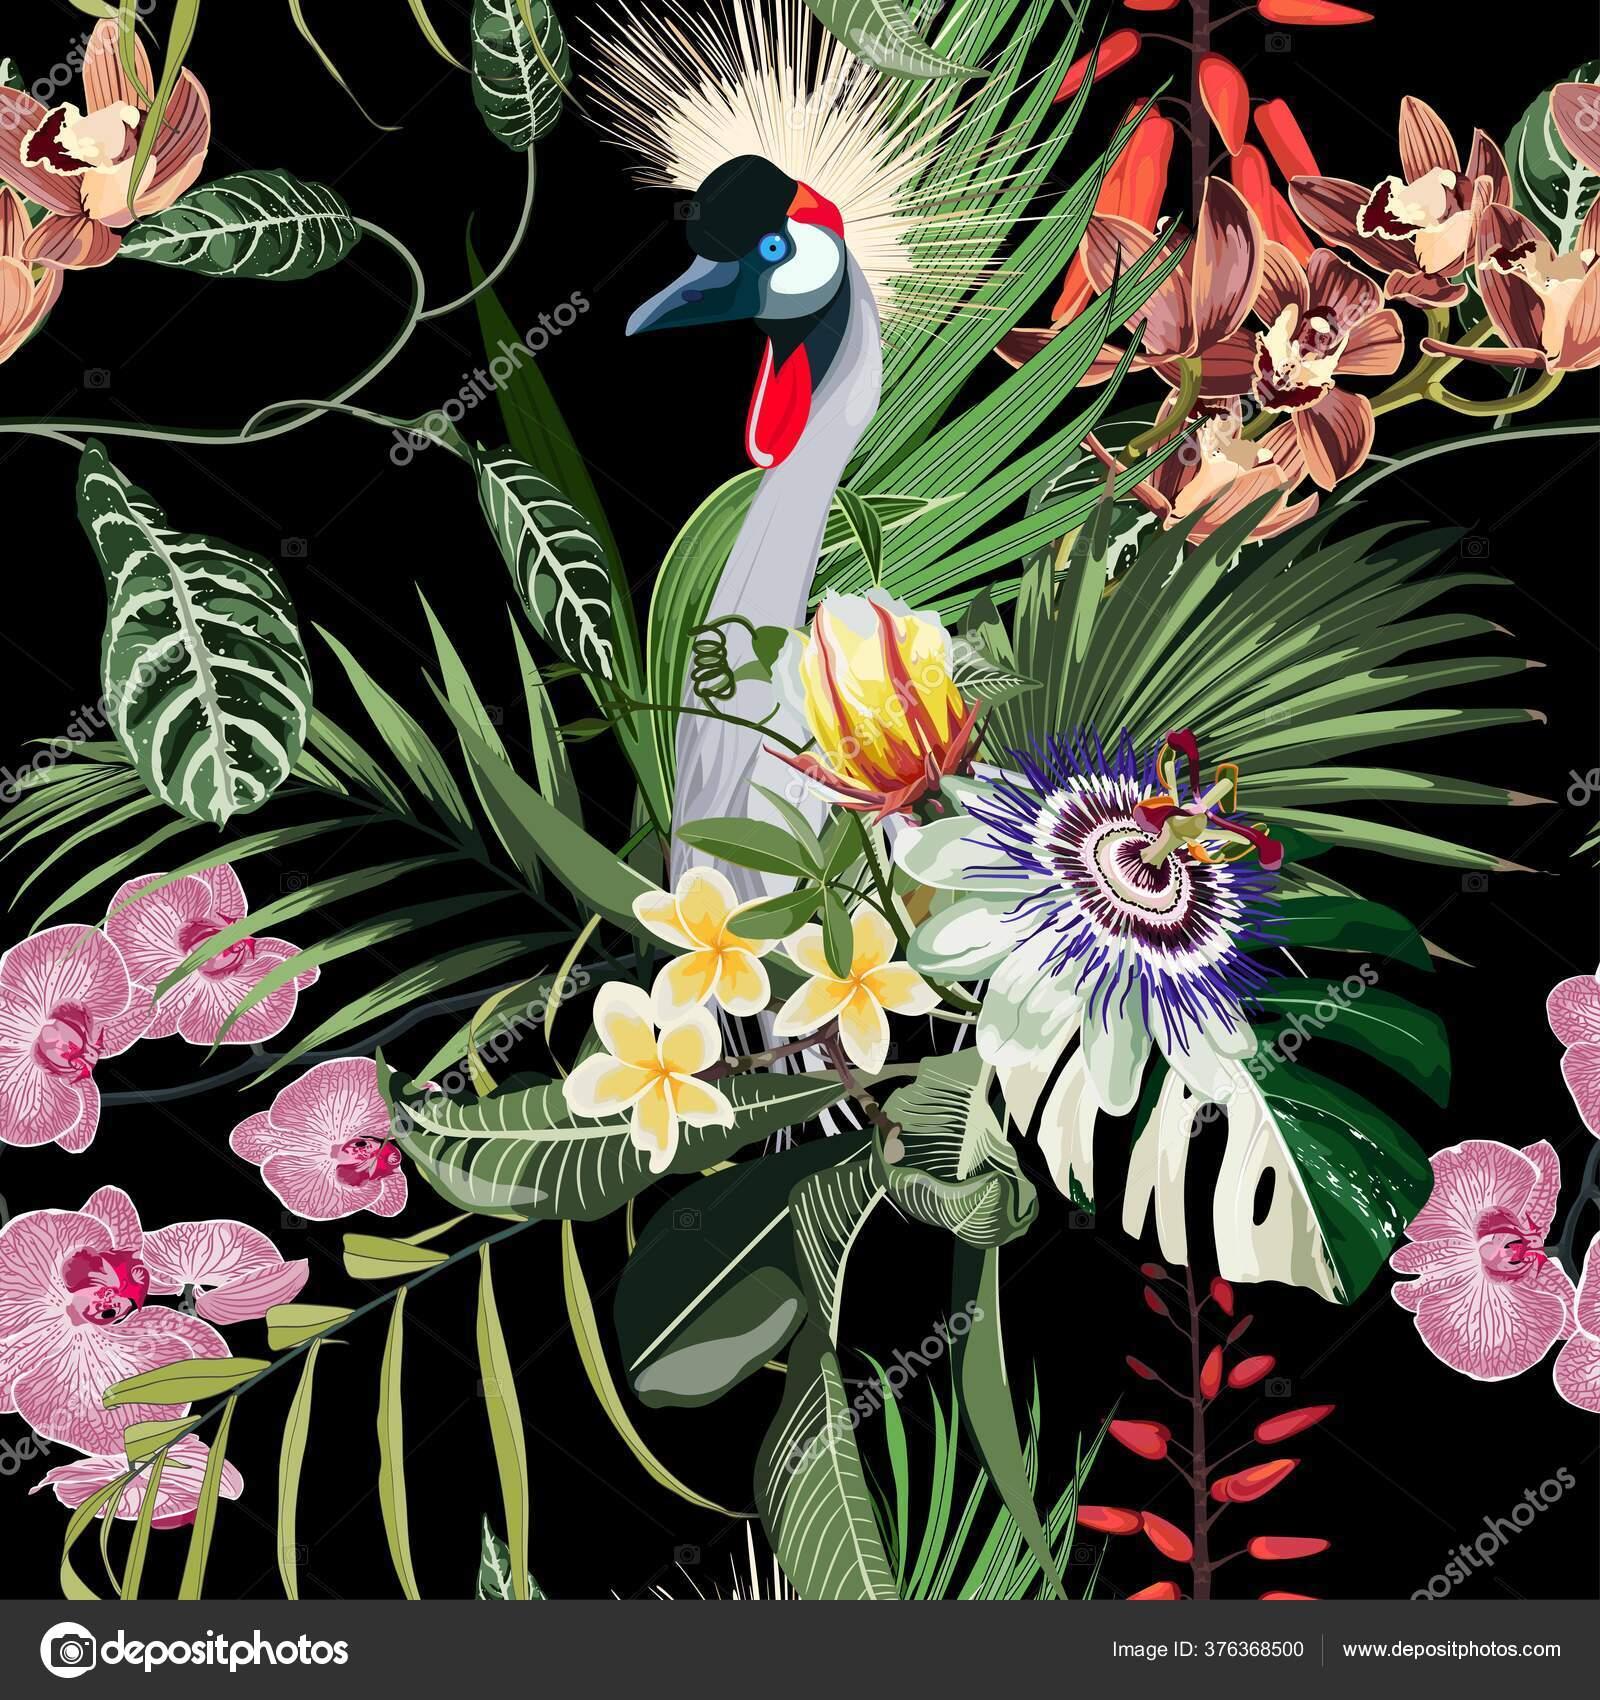 Burung Eksotis Bunga Gairah Daun Palem Monstera Latar Belakang Hitam Stok Vektor C 14jan092017 376368500